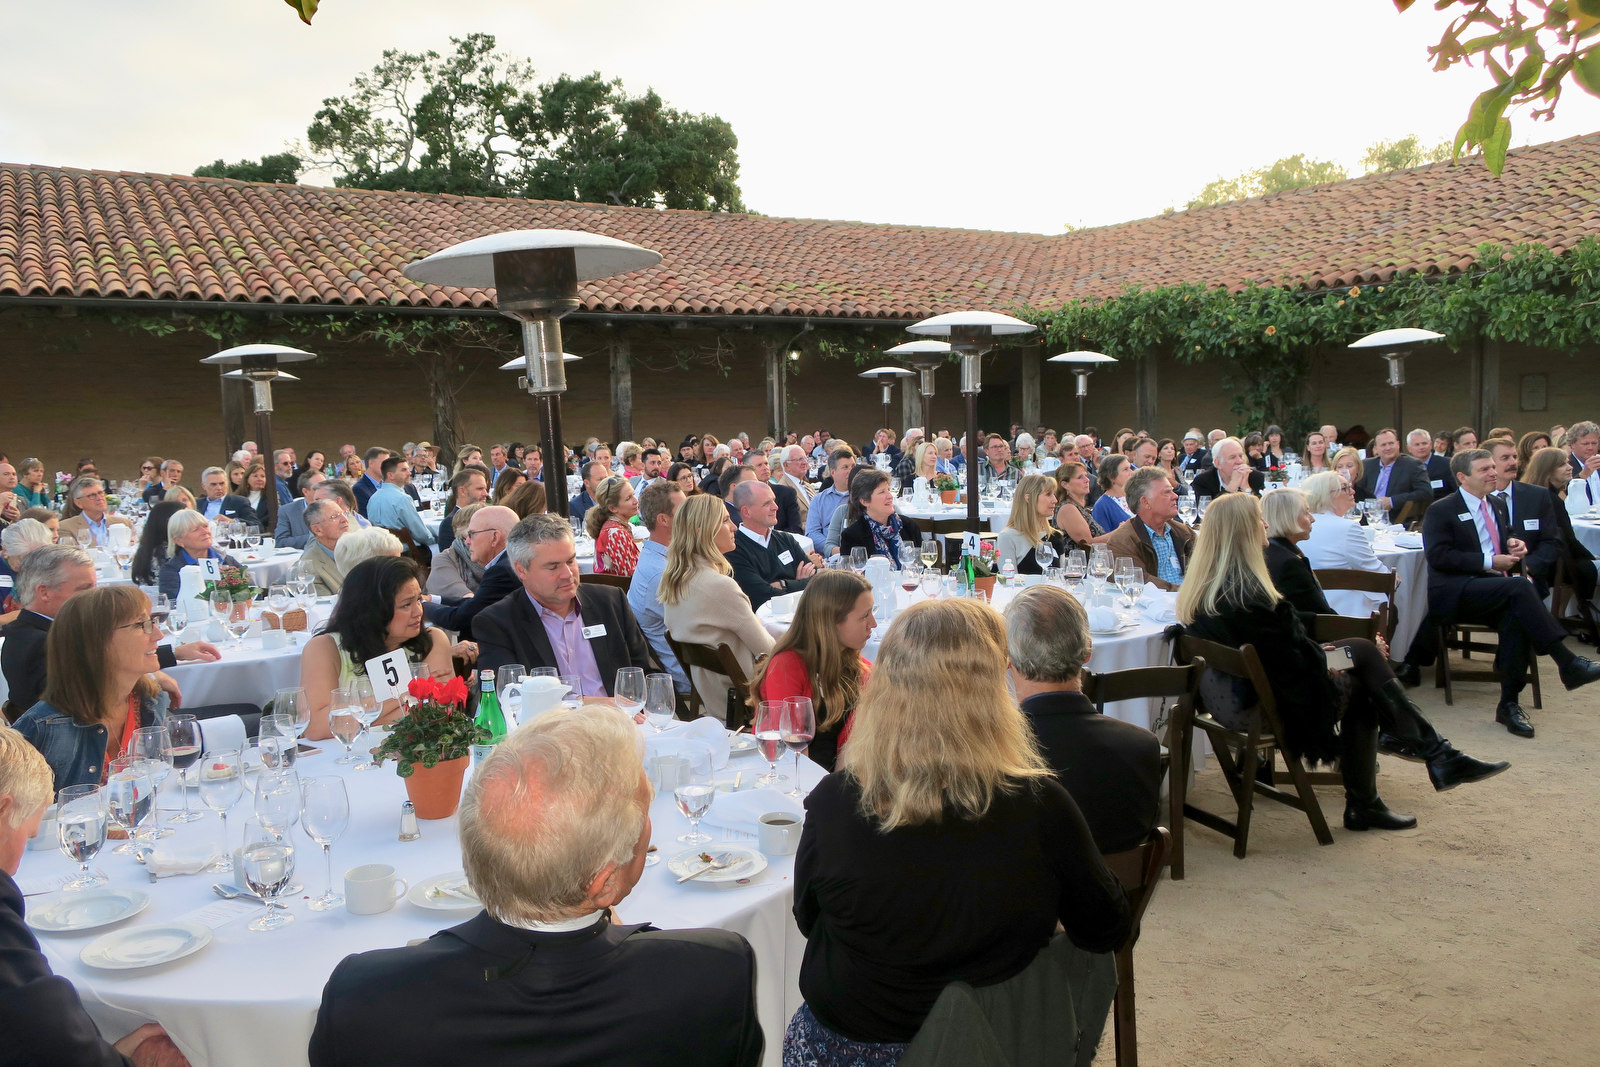 Scholarship Foundation Holds Annual Dinner - The Santa